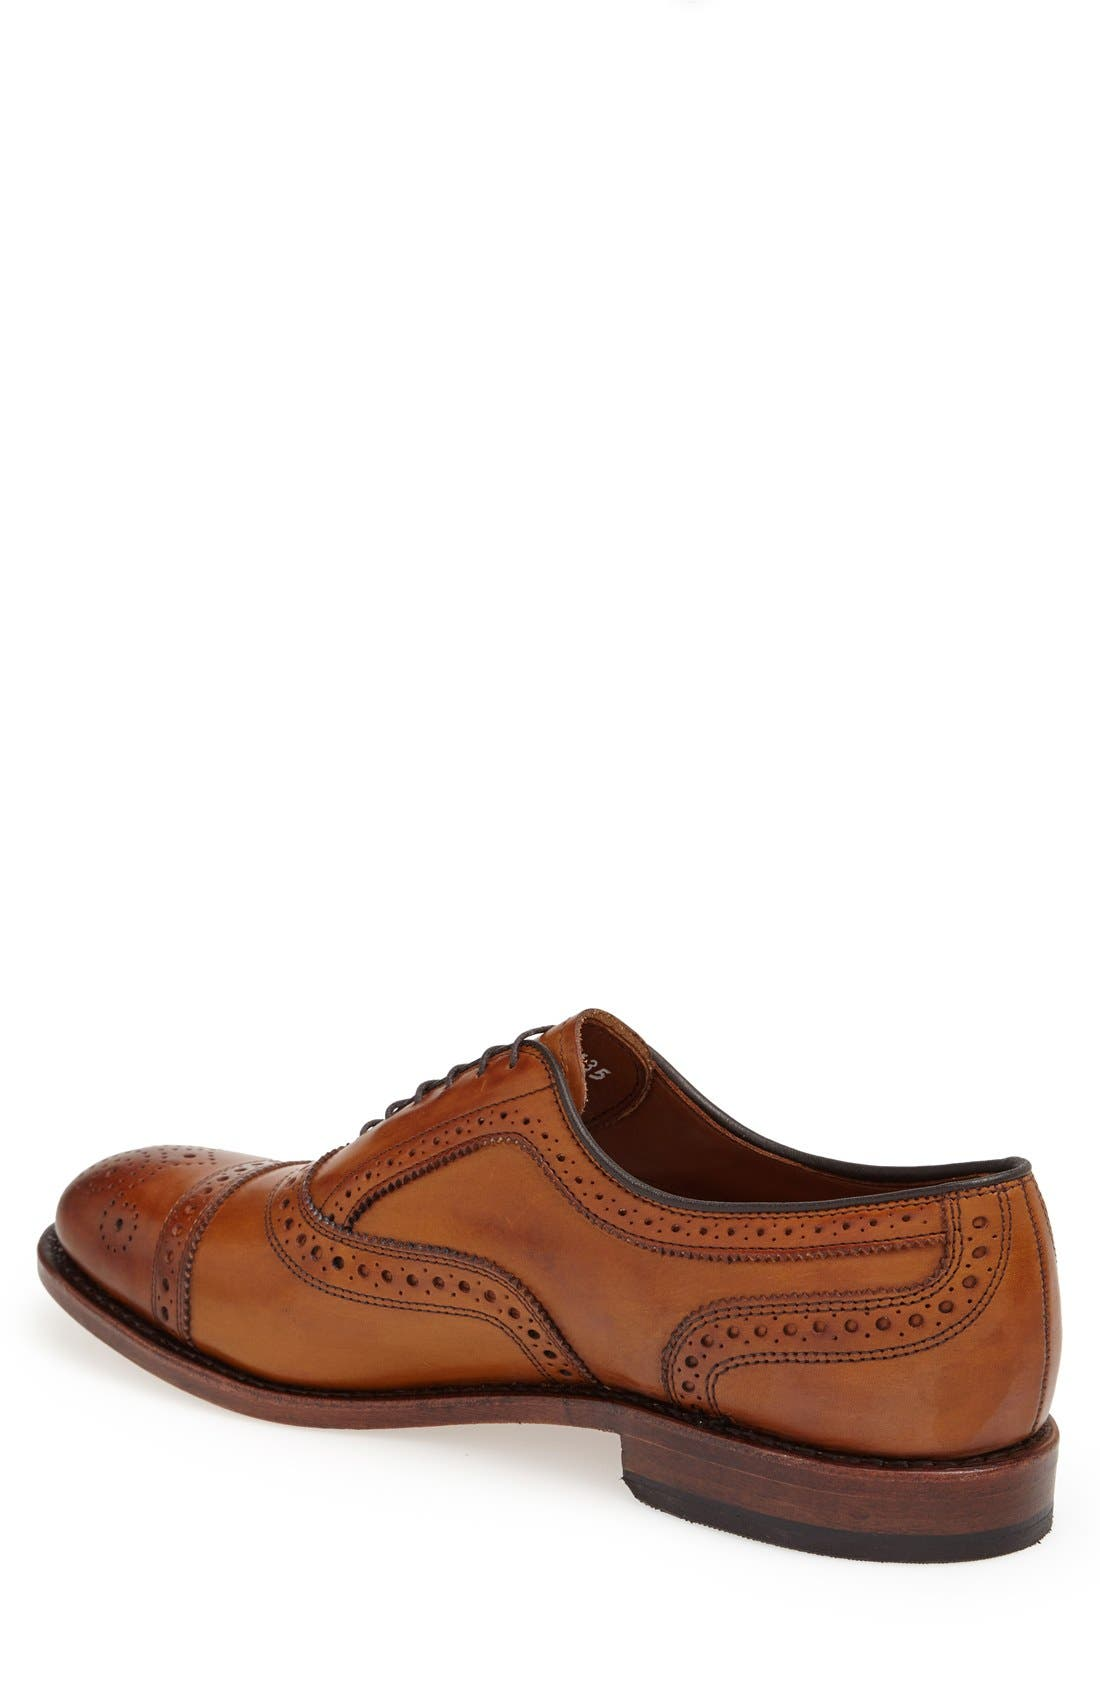 'Strand' Cap Toe Oxford,                             Alternate thumbnail 2, color,                             Walnut Leather